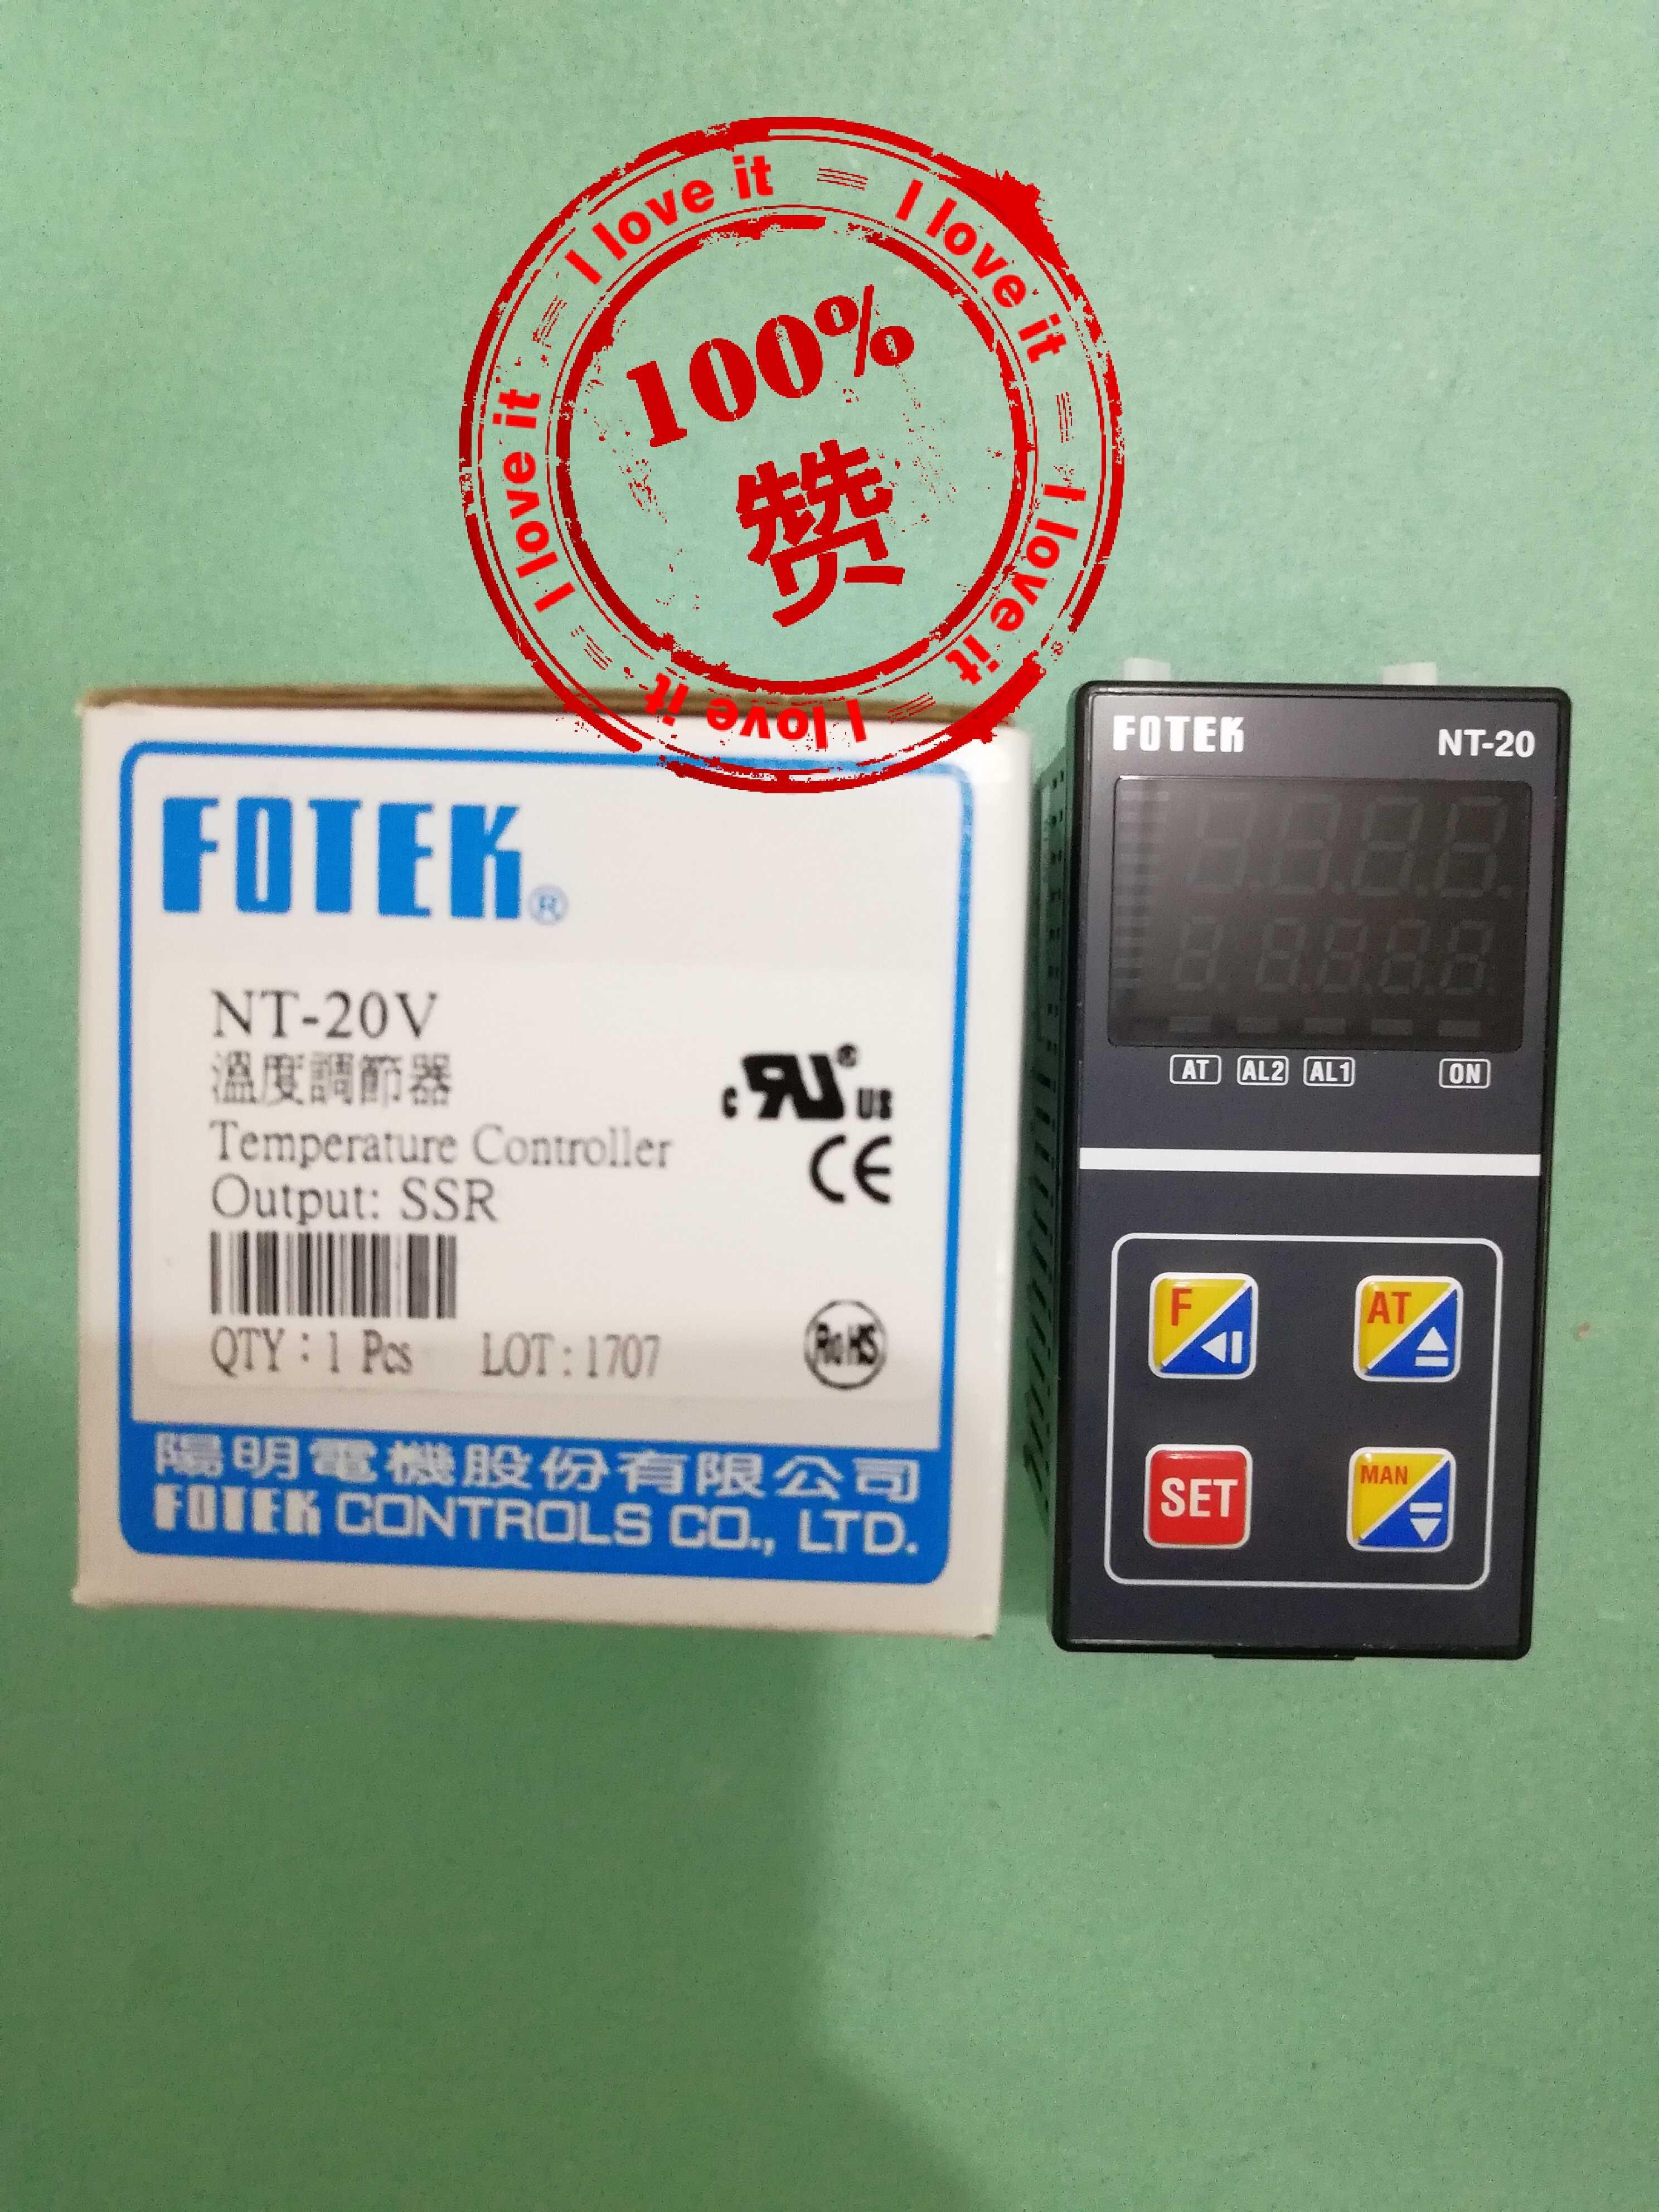 100 % Original Thermostat Temperature Regulator NT-20V False Penalty 10